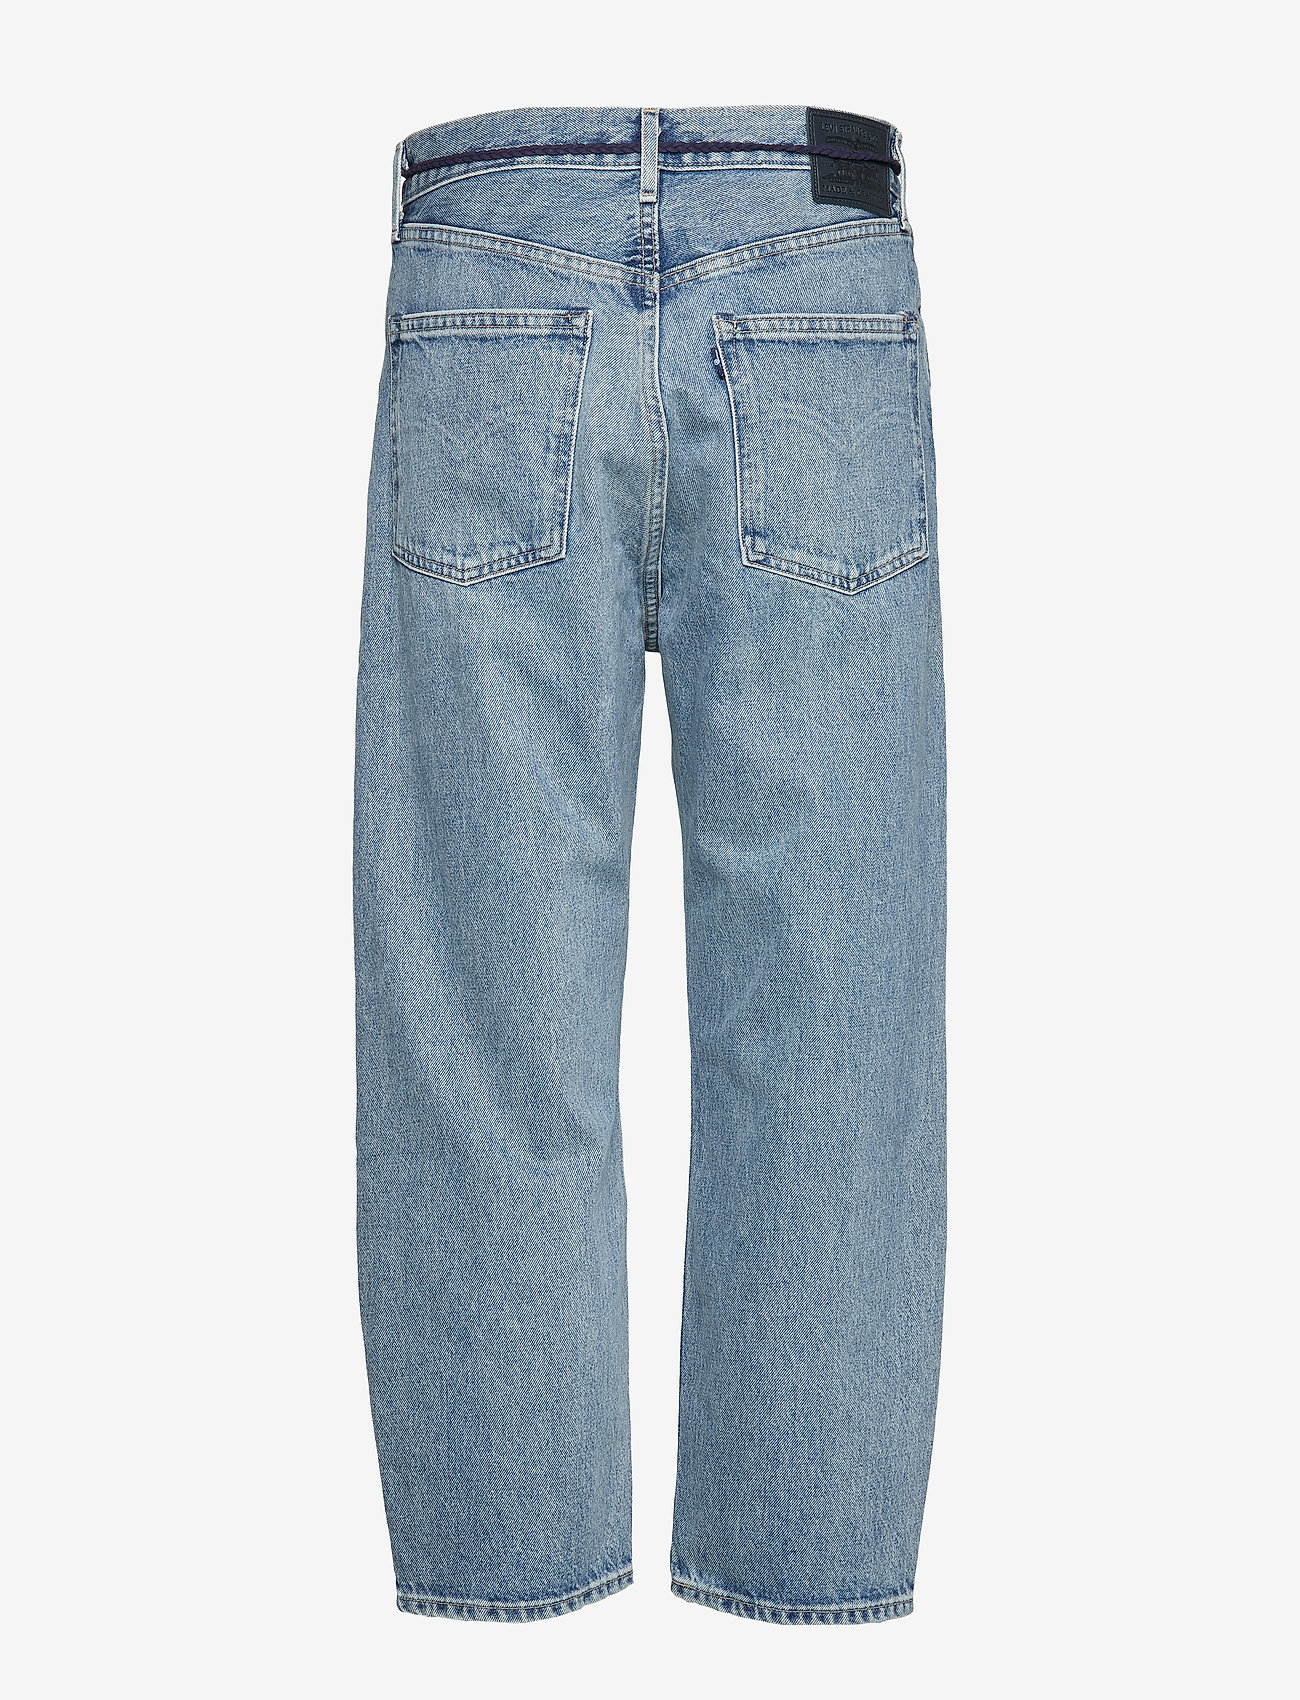 Levi's Made & Crafted - LMC BARREL LMC LEGEND - boyfriend jeans - med indigo - worn in